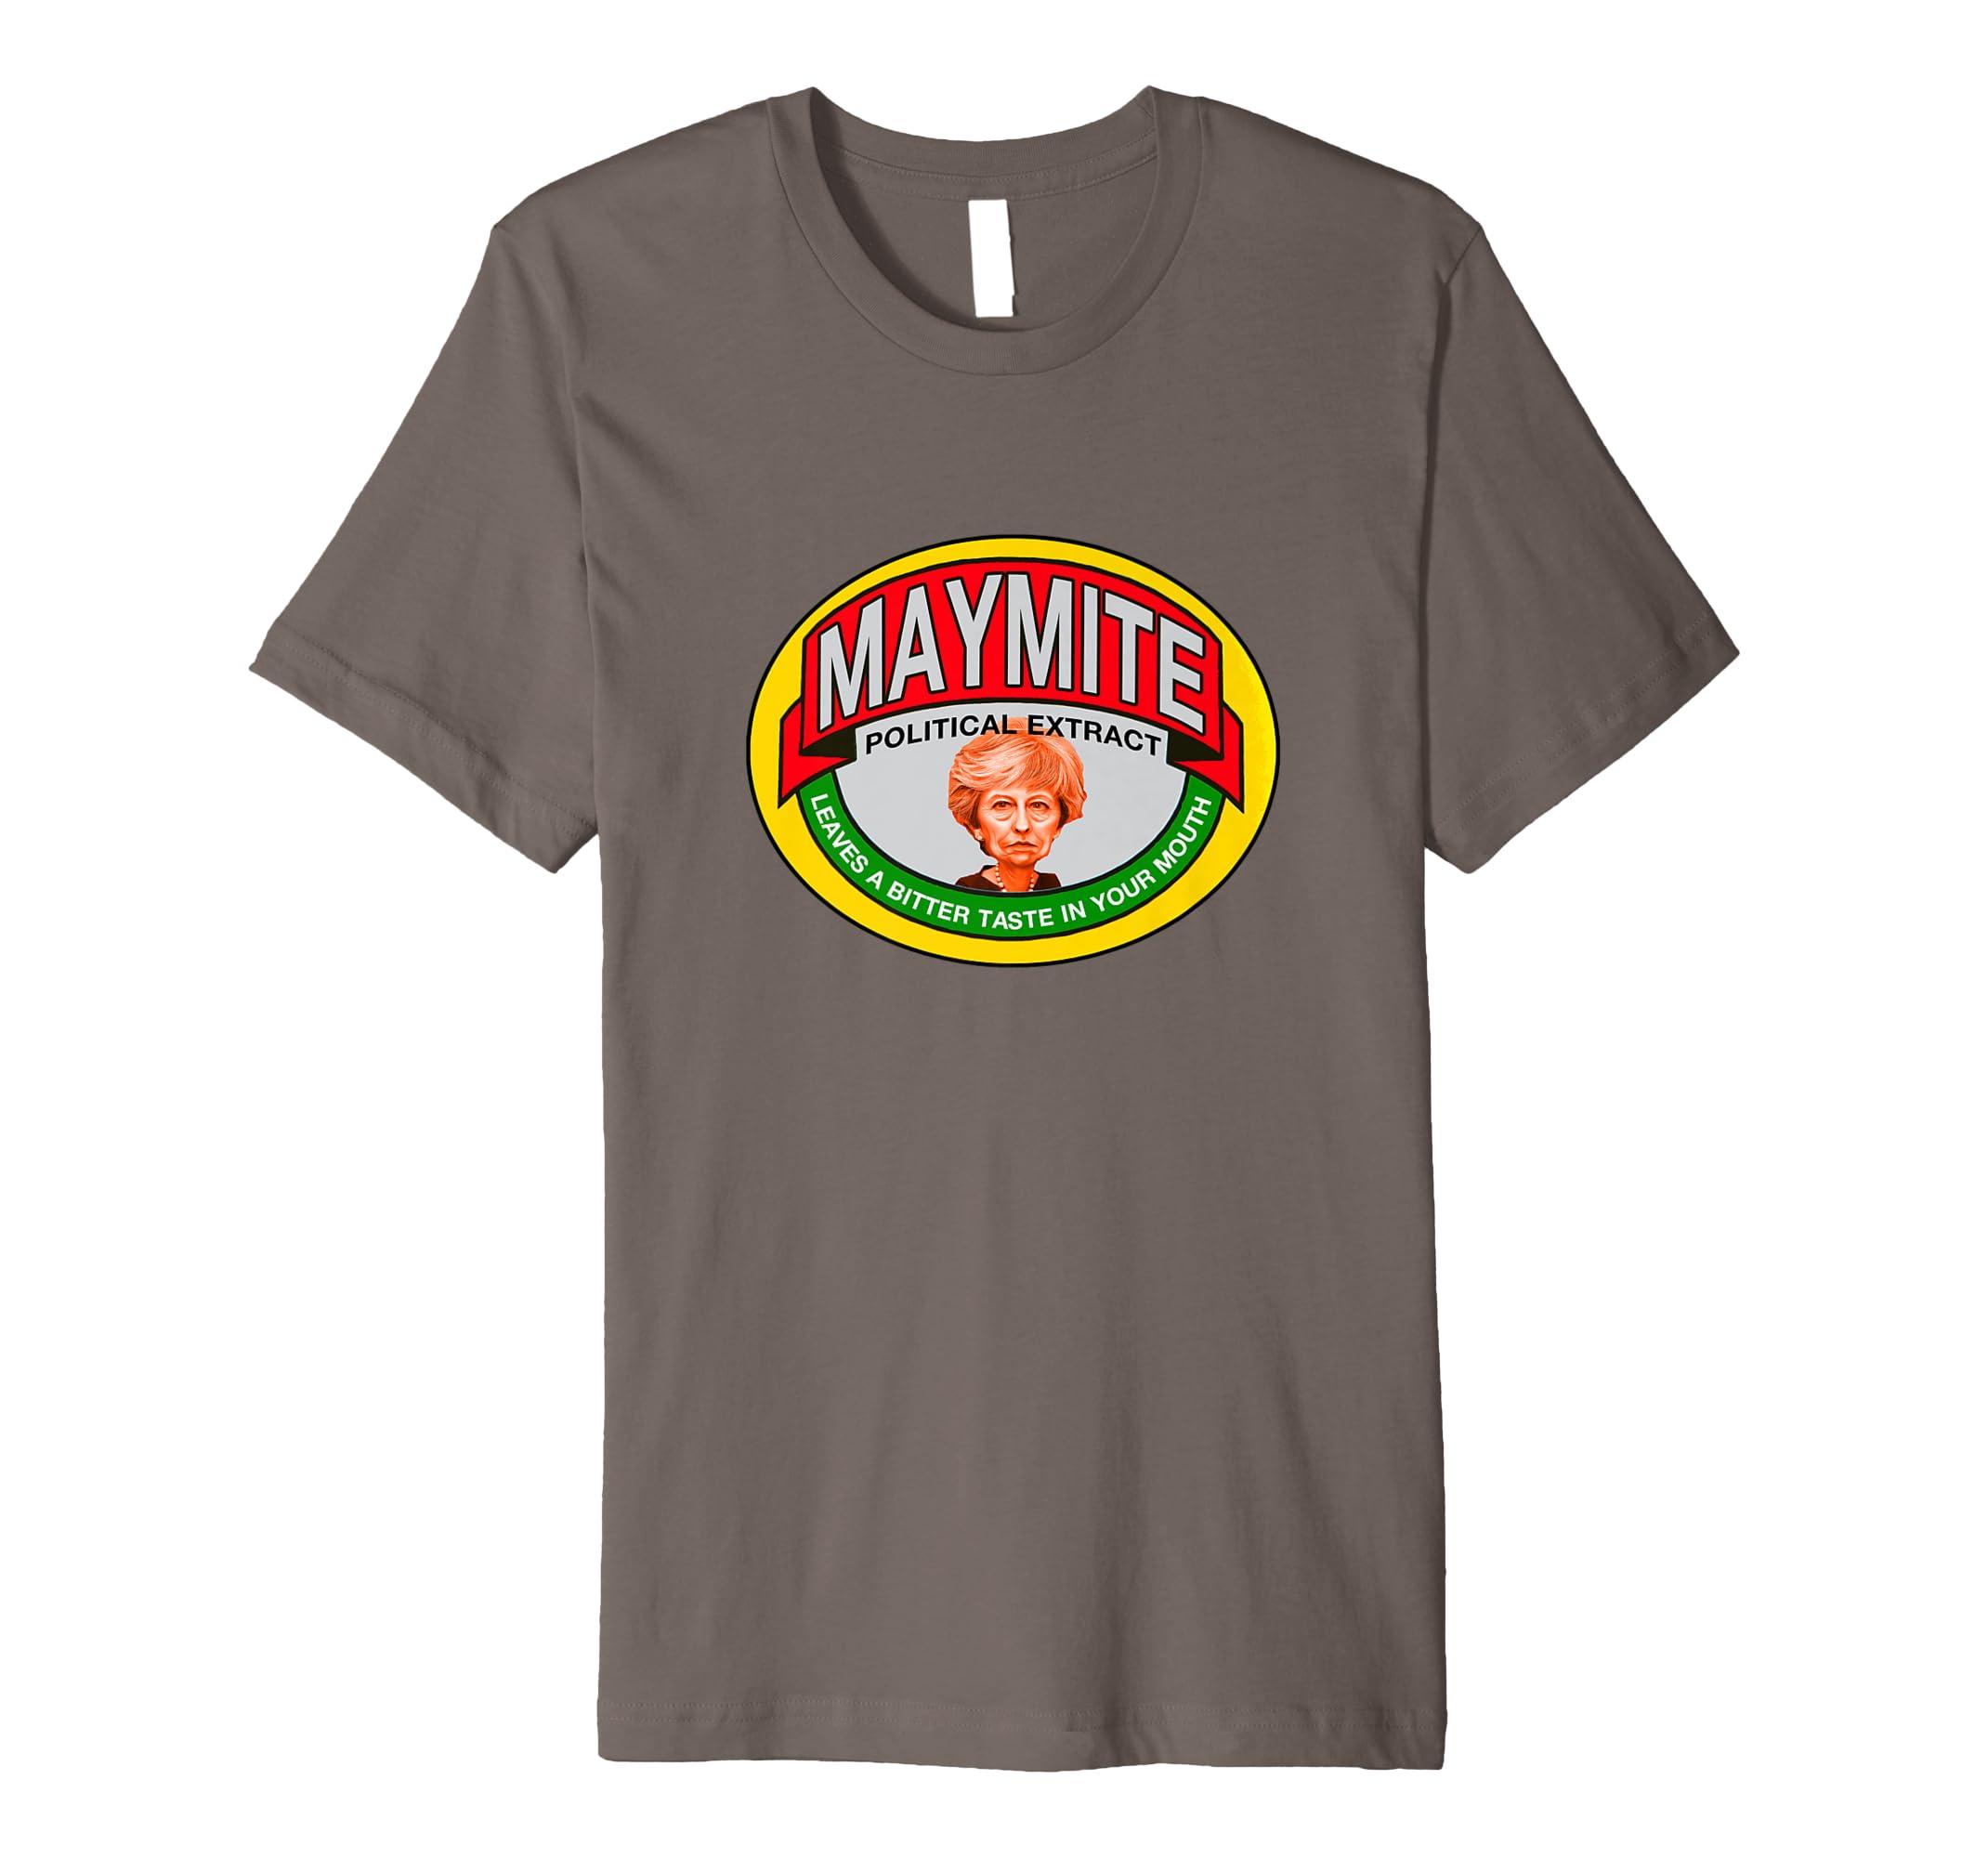 7a5dedbe MAYMITE THERESA BREXIT REMAINER EU UK MAY - T-shirt TEE: Amazon.co.uk:  Clothing